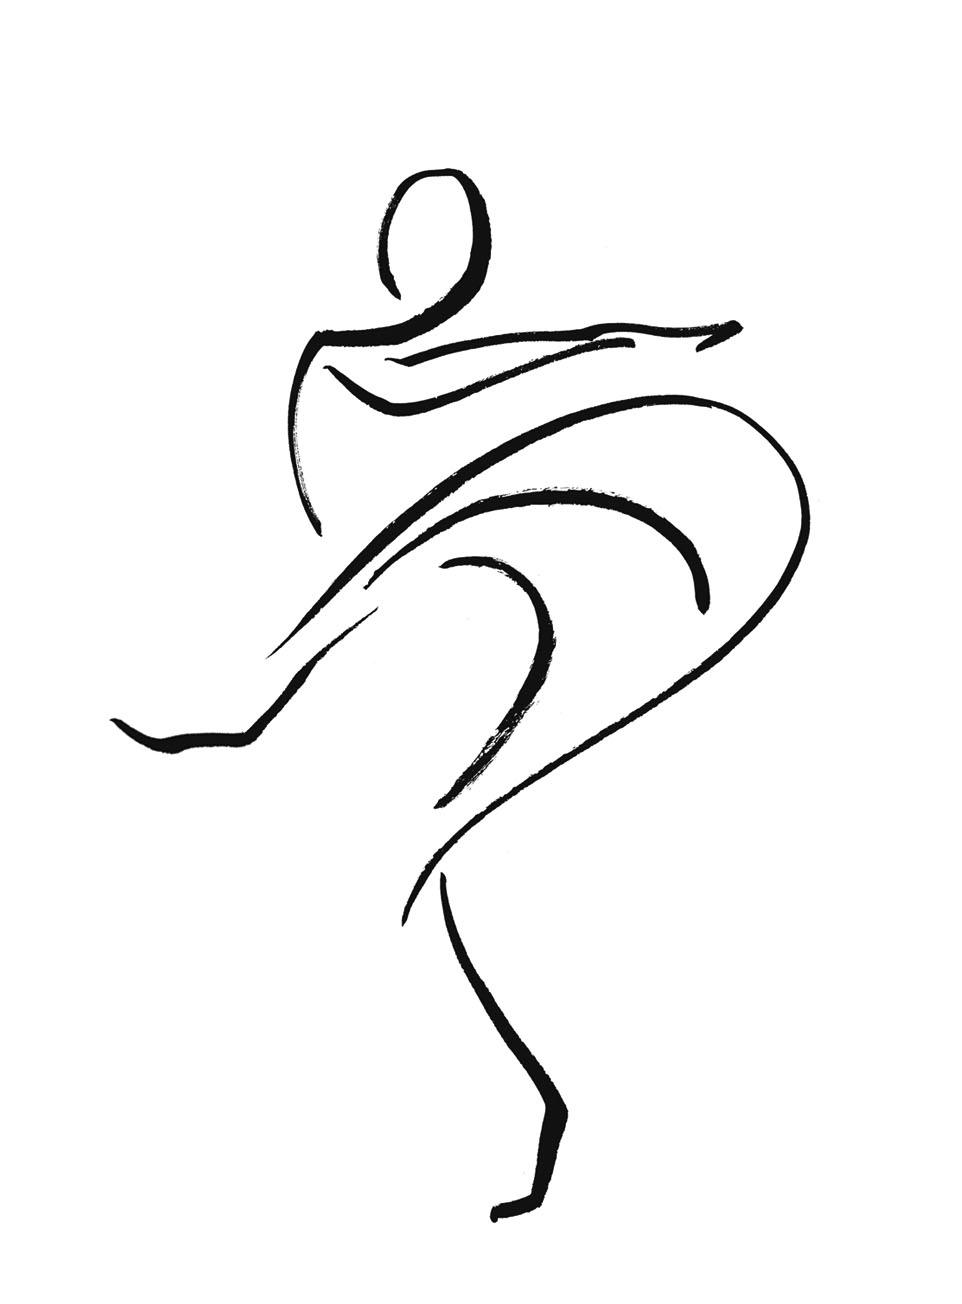 Eglantine rouge programme 2013 2014 danse - Dessin de danseuse moderne jazz ...